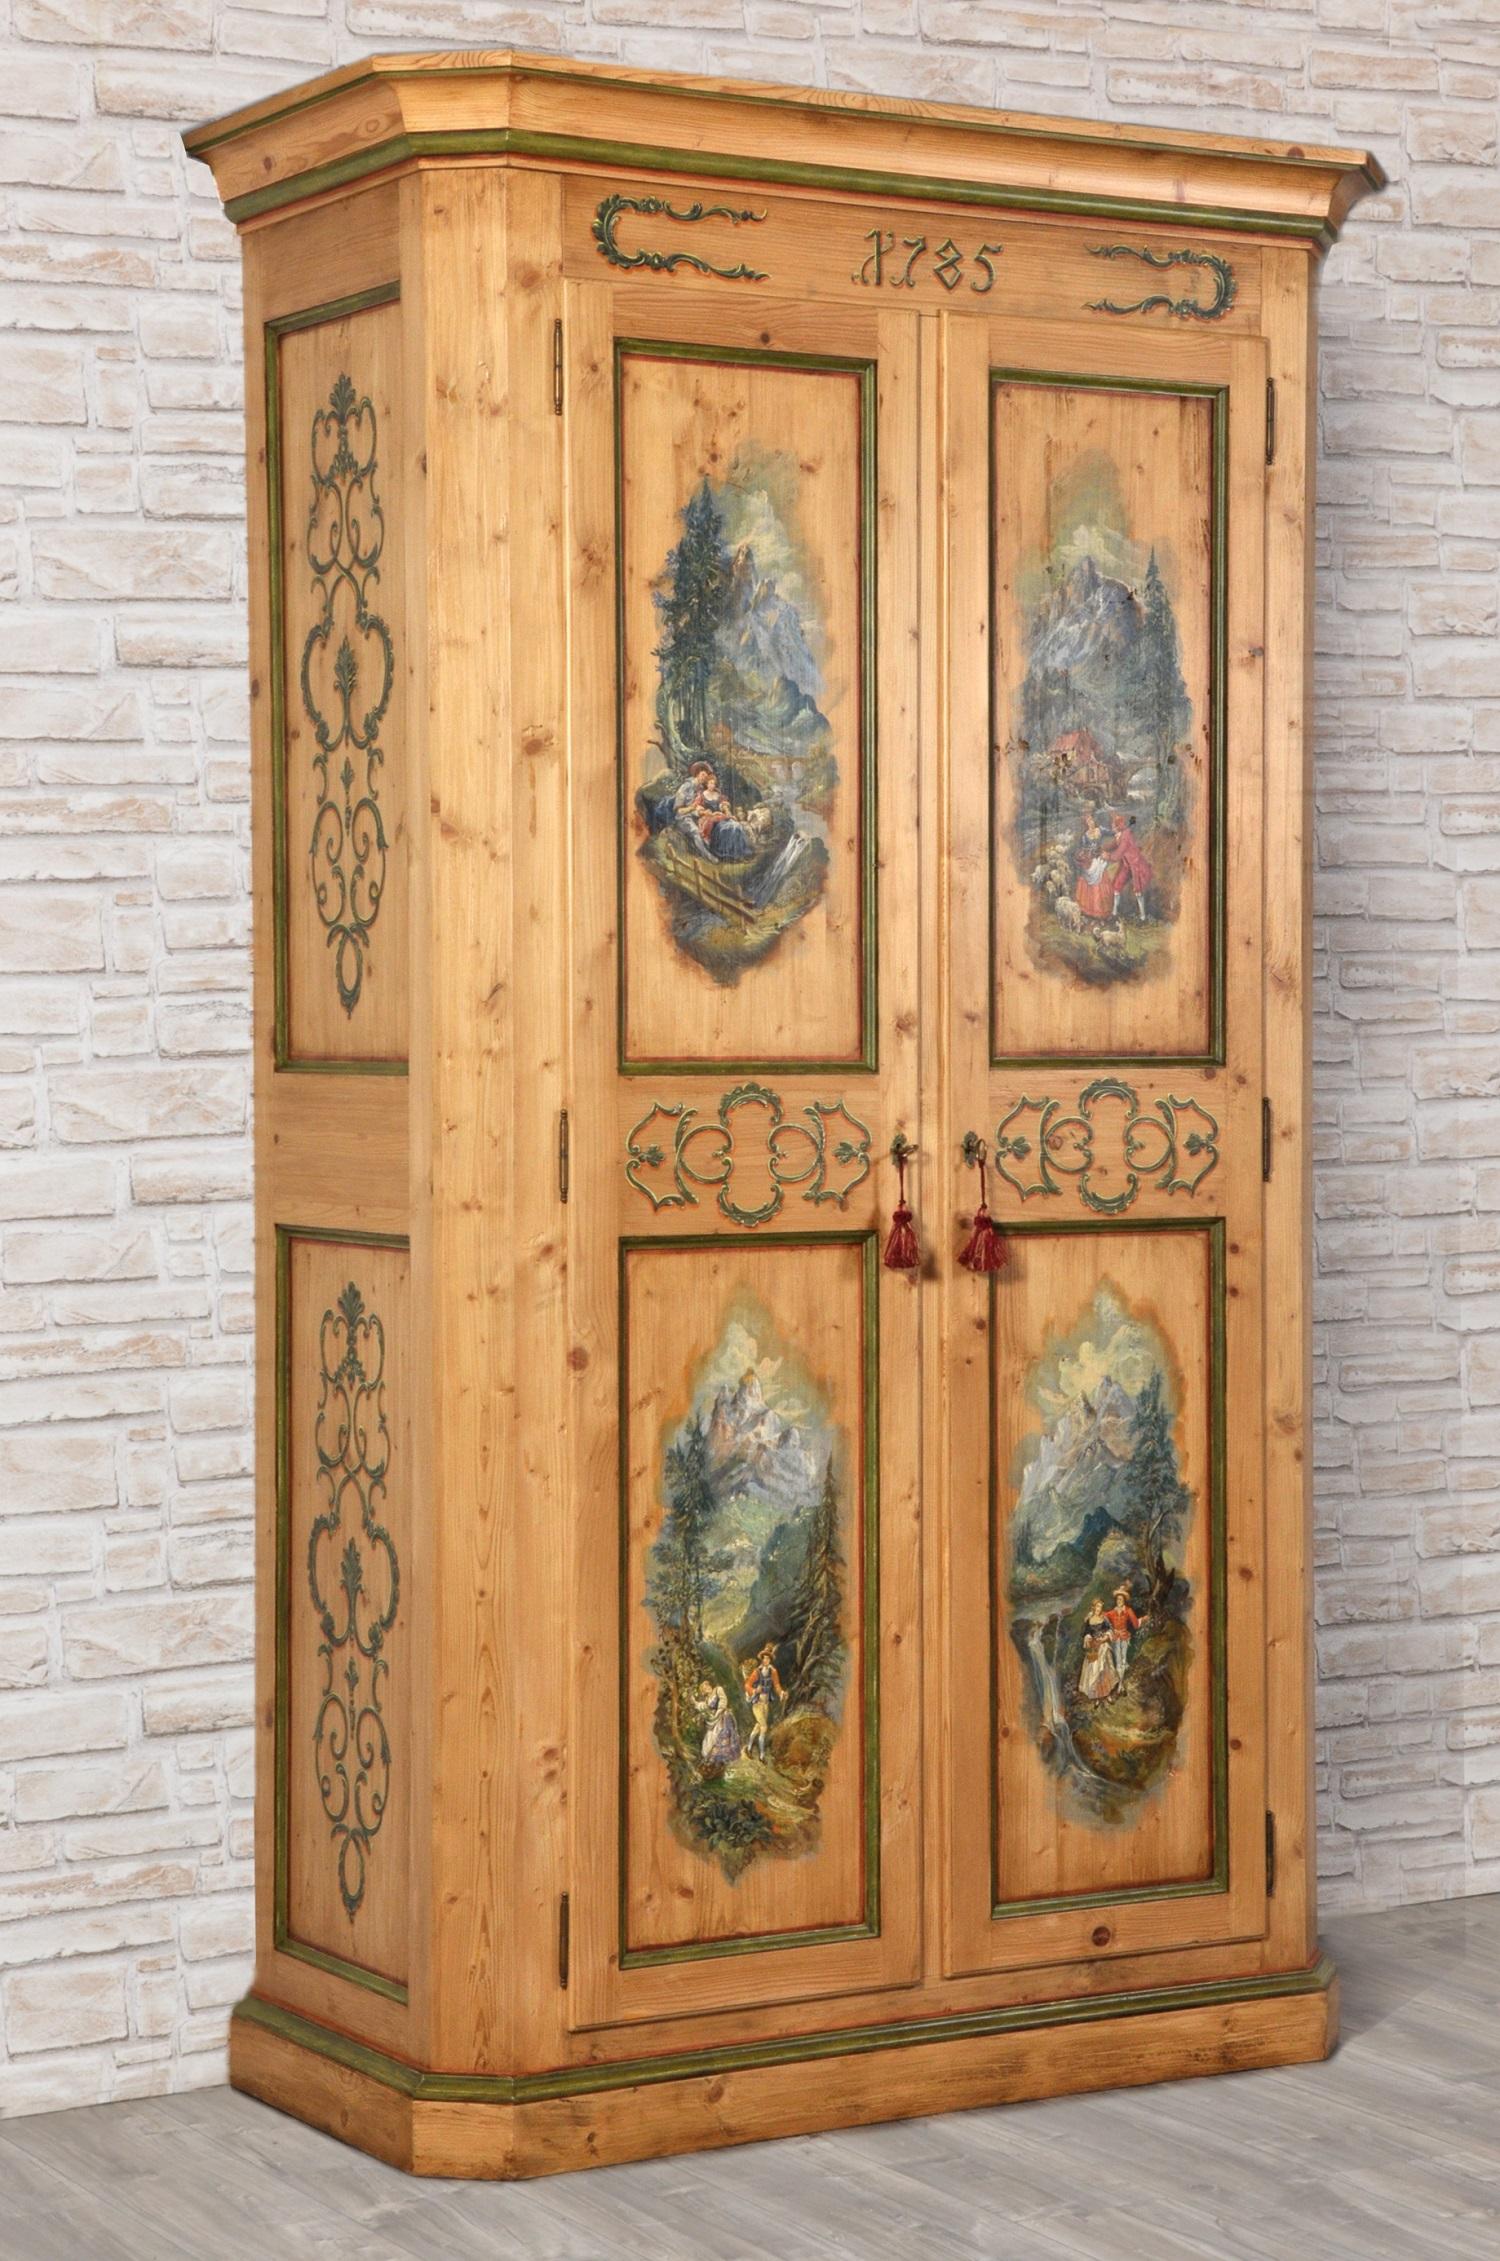 Armadio a 2 ante in abete antico dipinto a mano in stile barocco ...